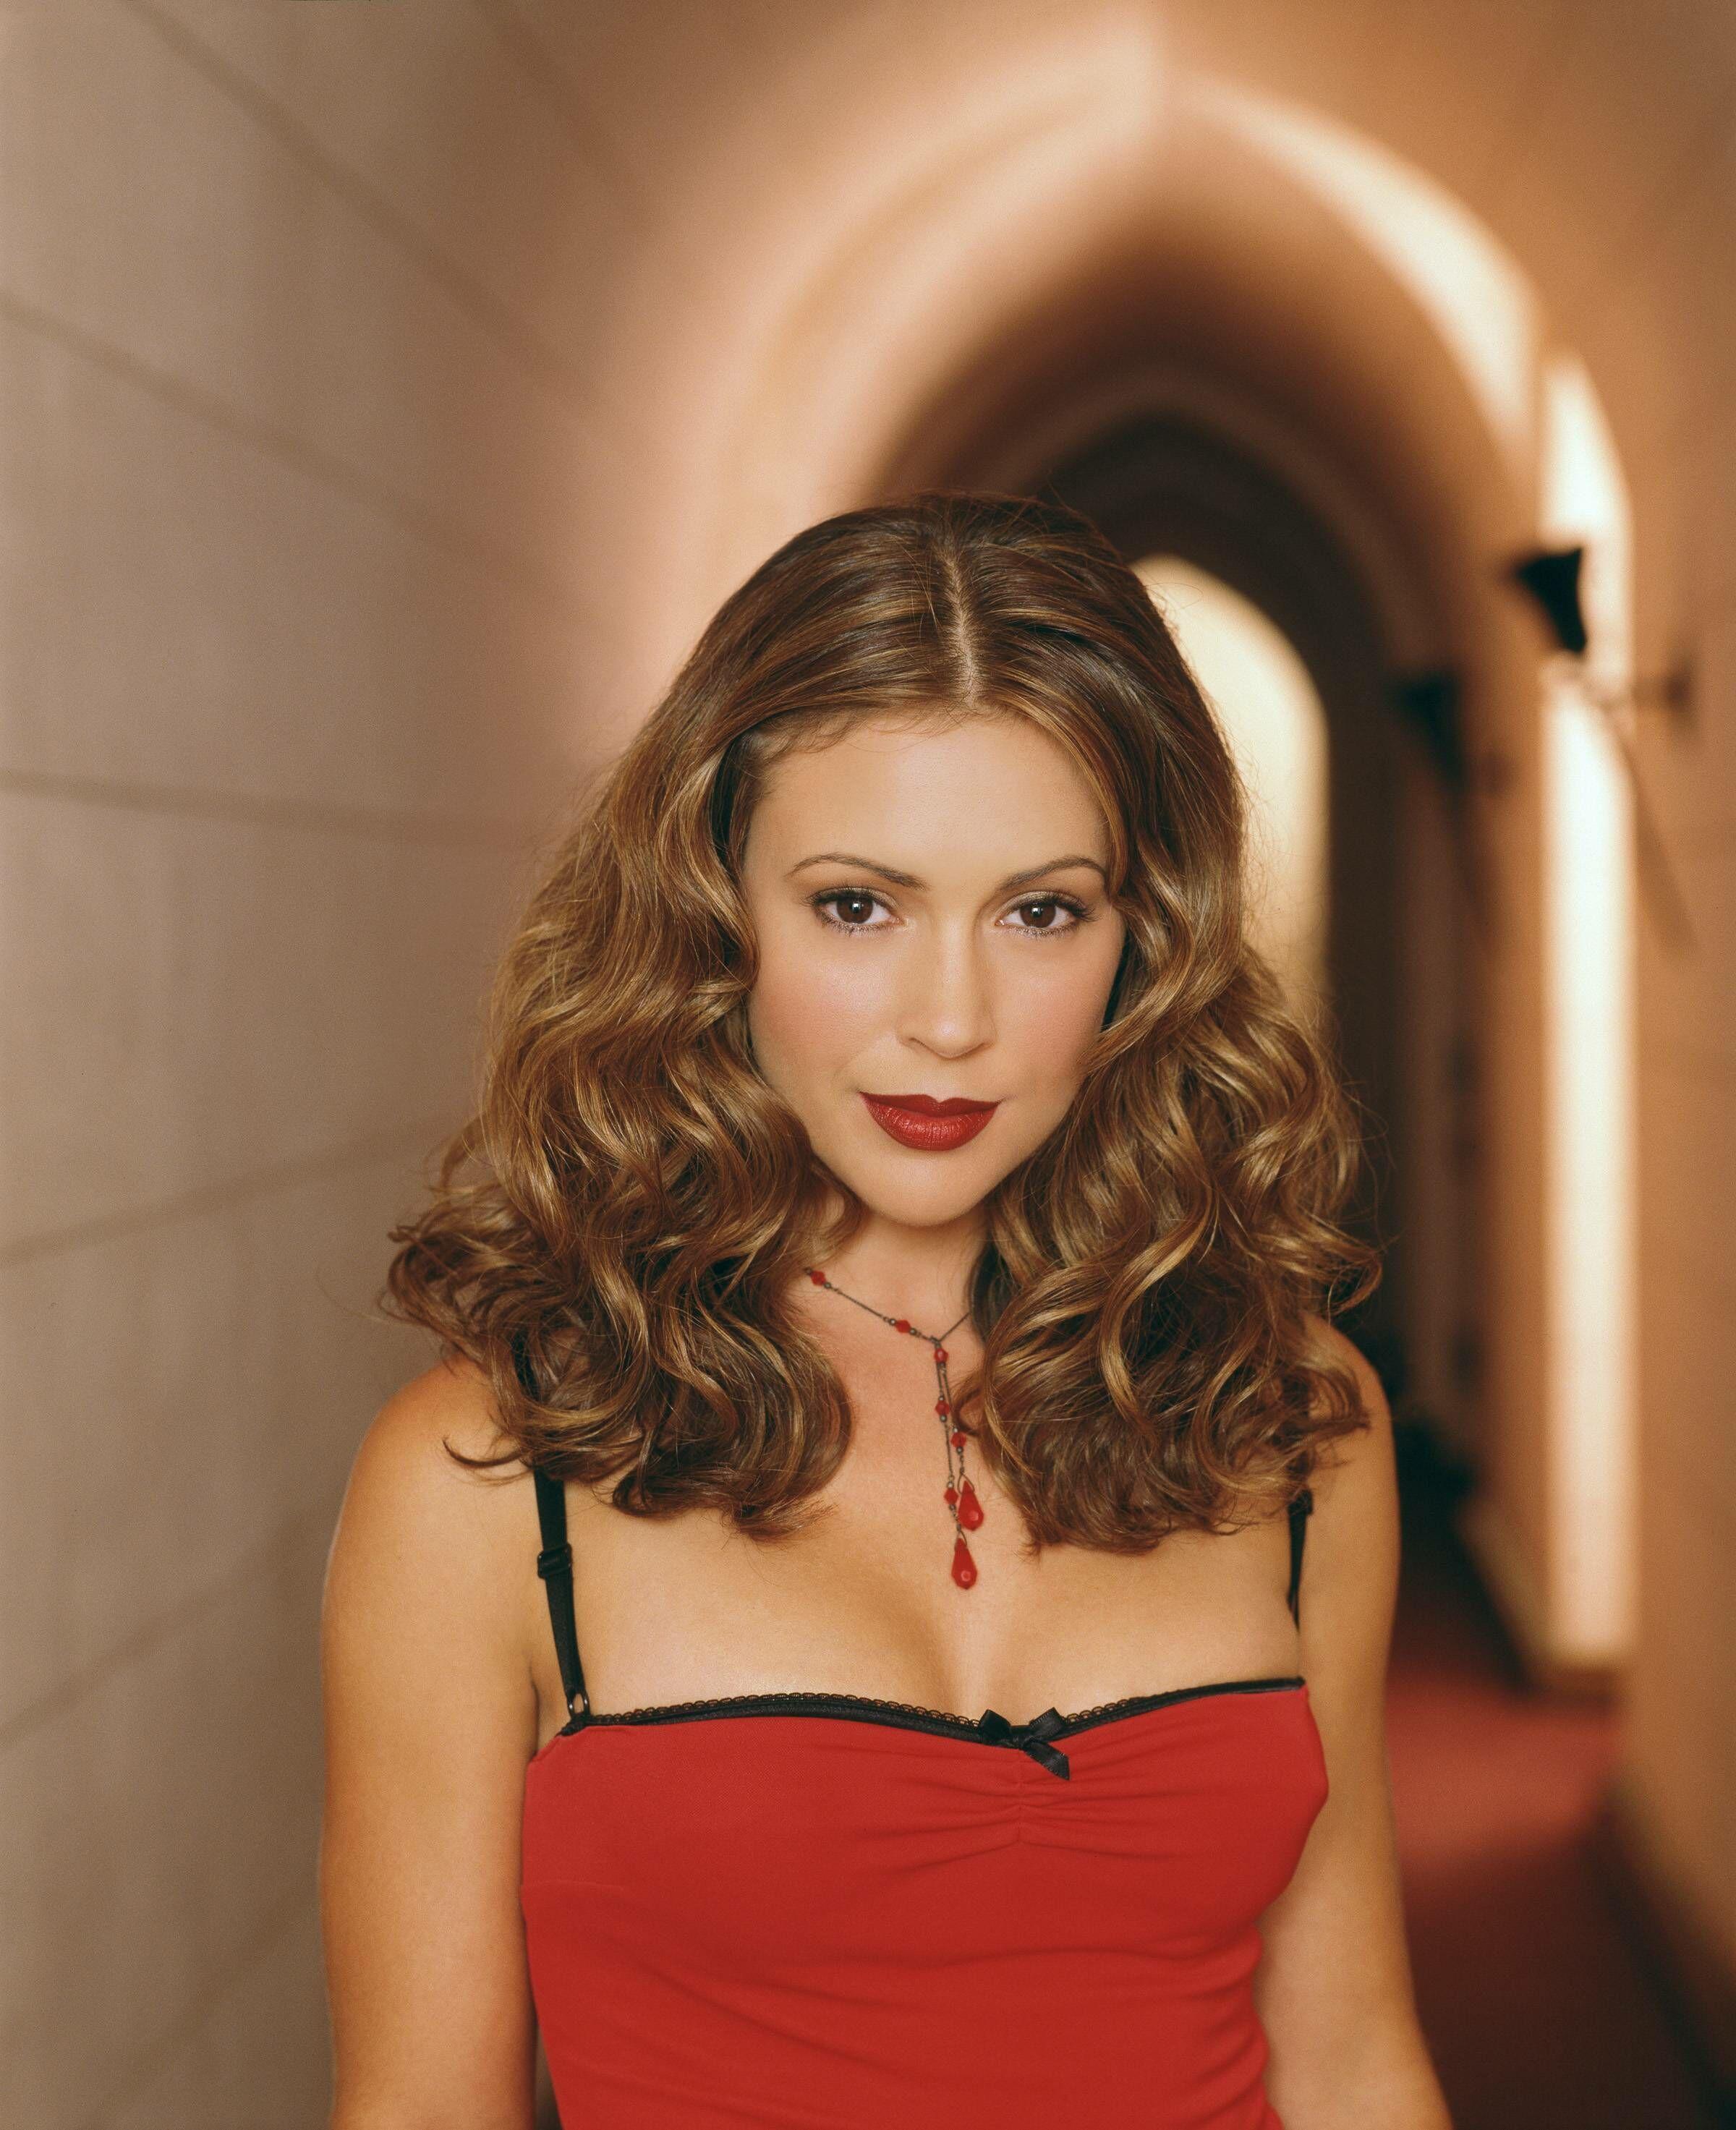 Female Celebrities With Light Brown Hair intended for charmed - season 4 promo   charmed   pinterest   alyssa milano